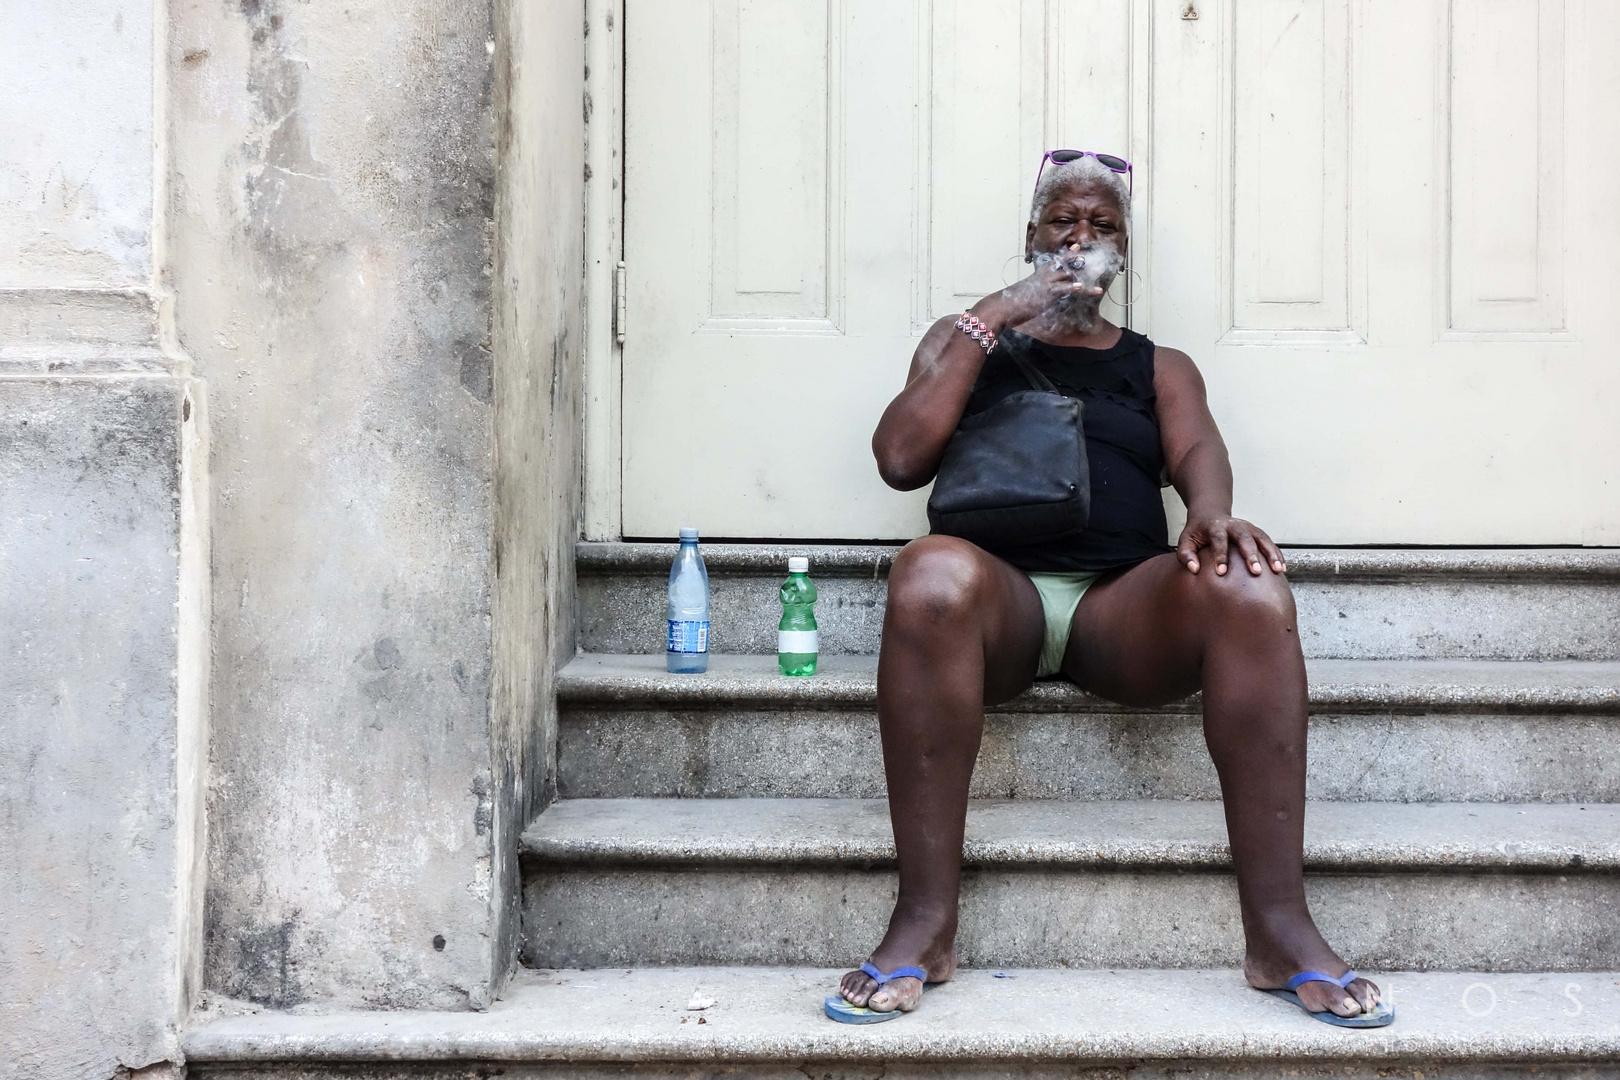 The smoke of Cuba